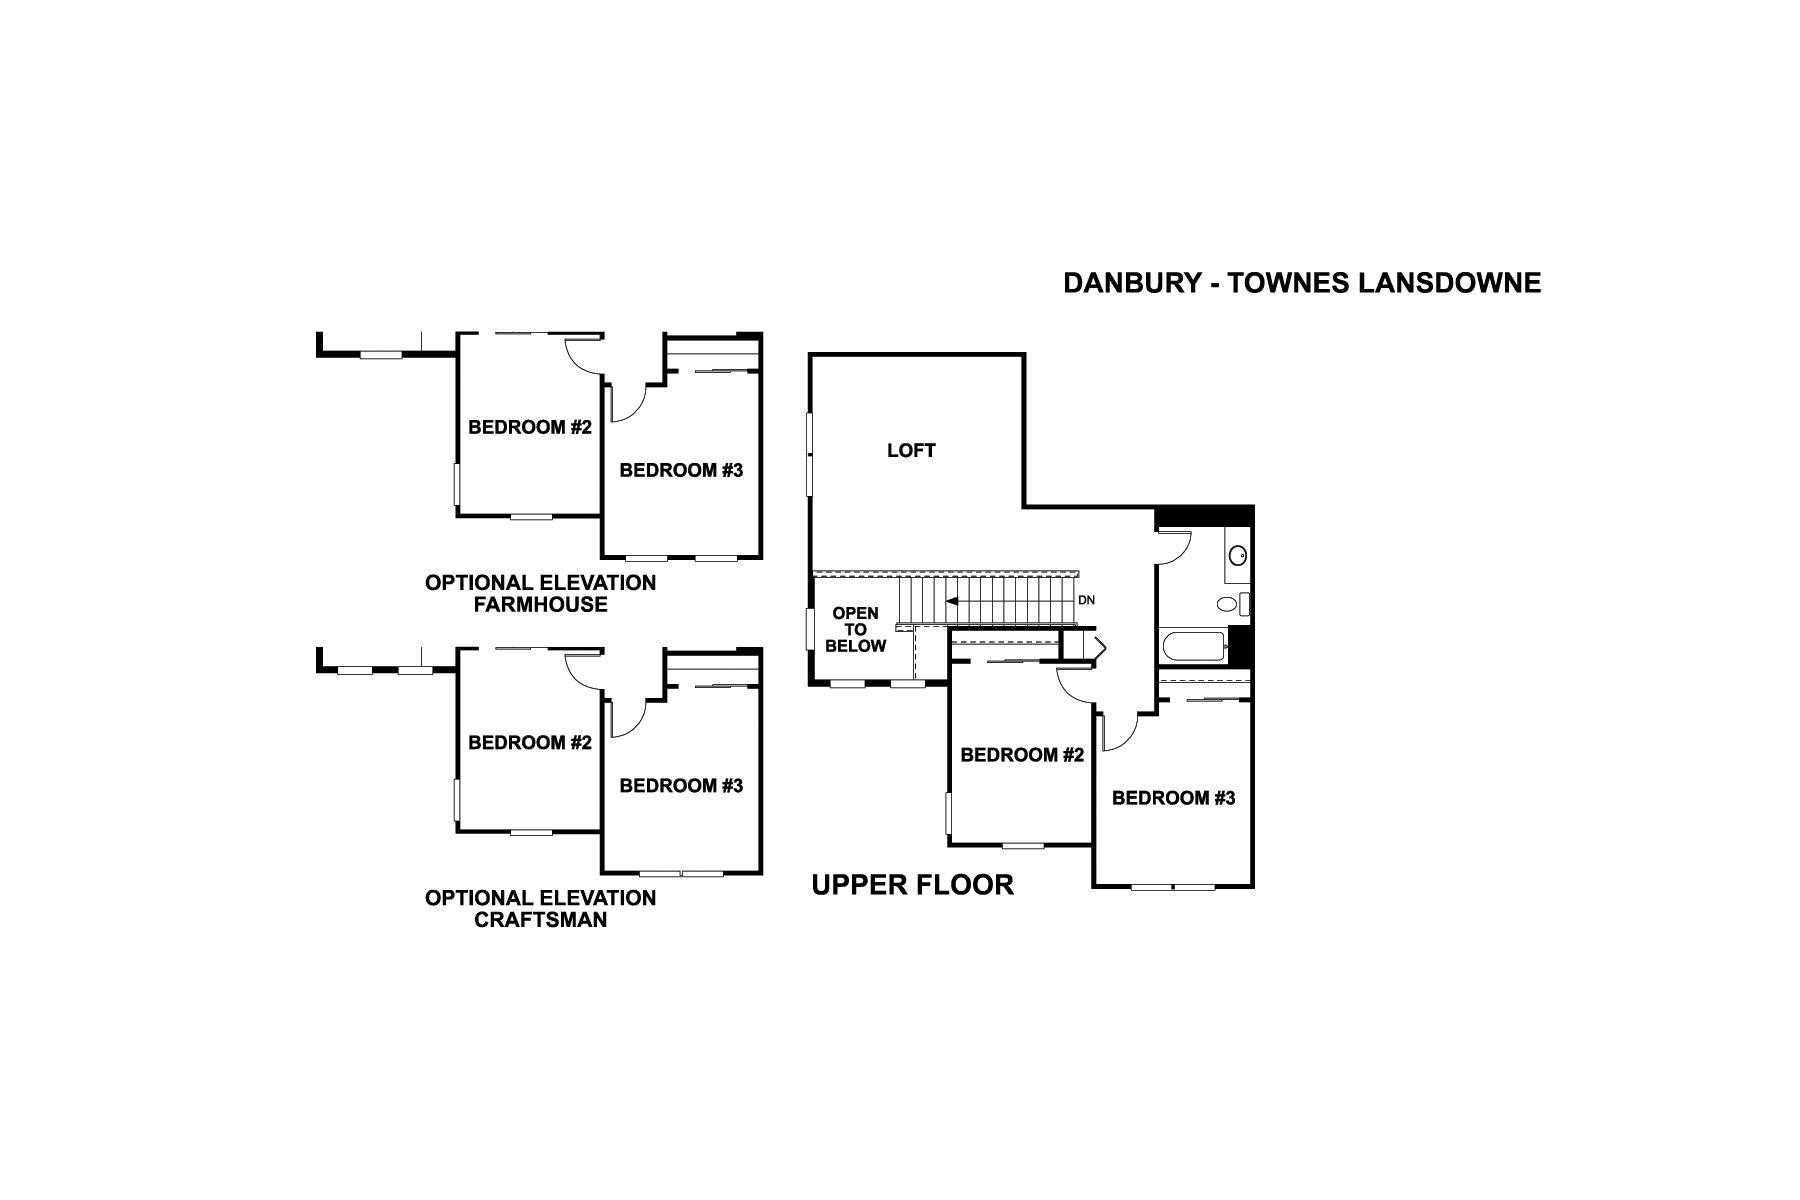 CHIC-Lansdowne-Danbury-SecondFloor